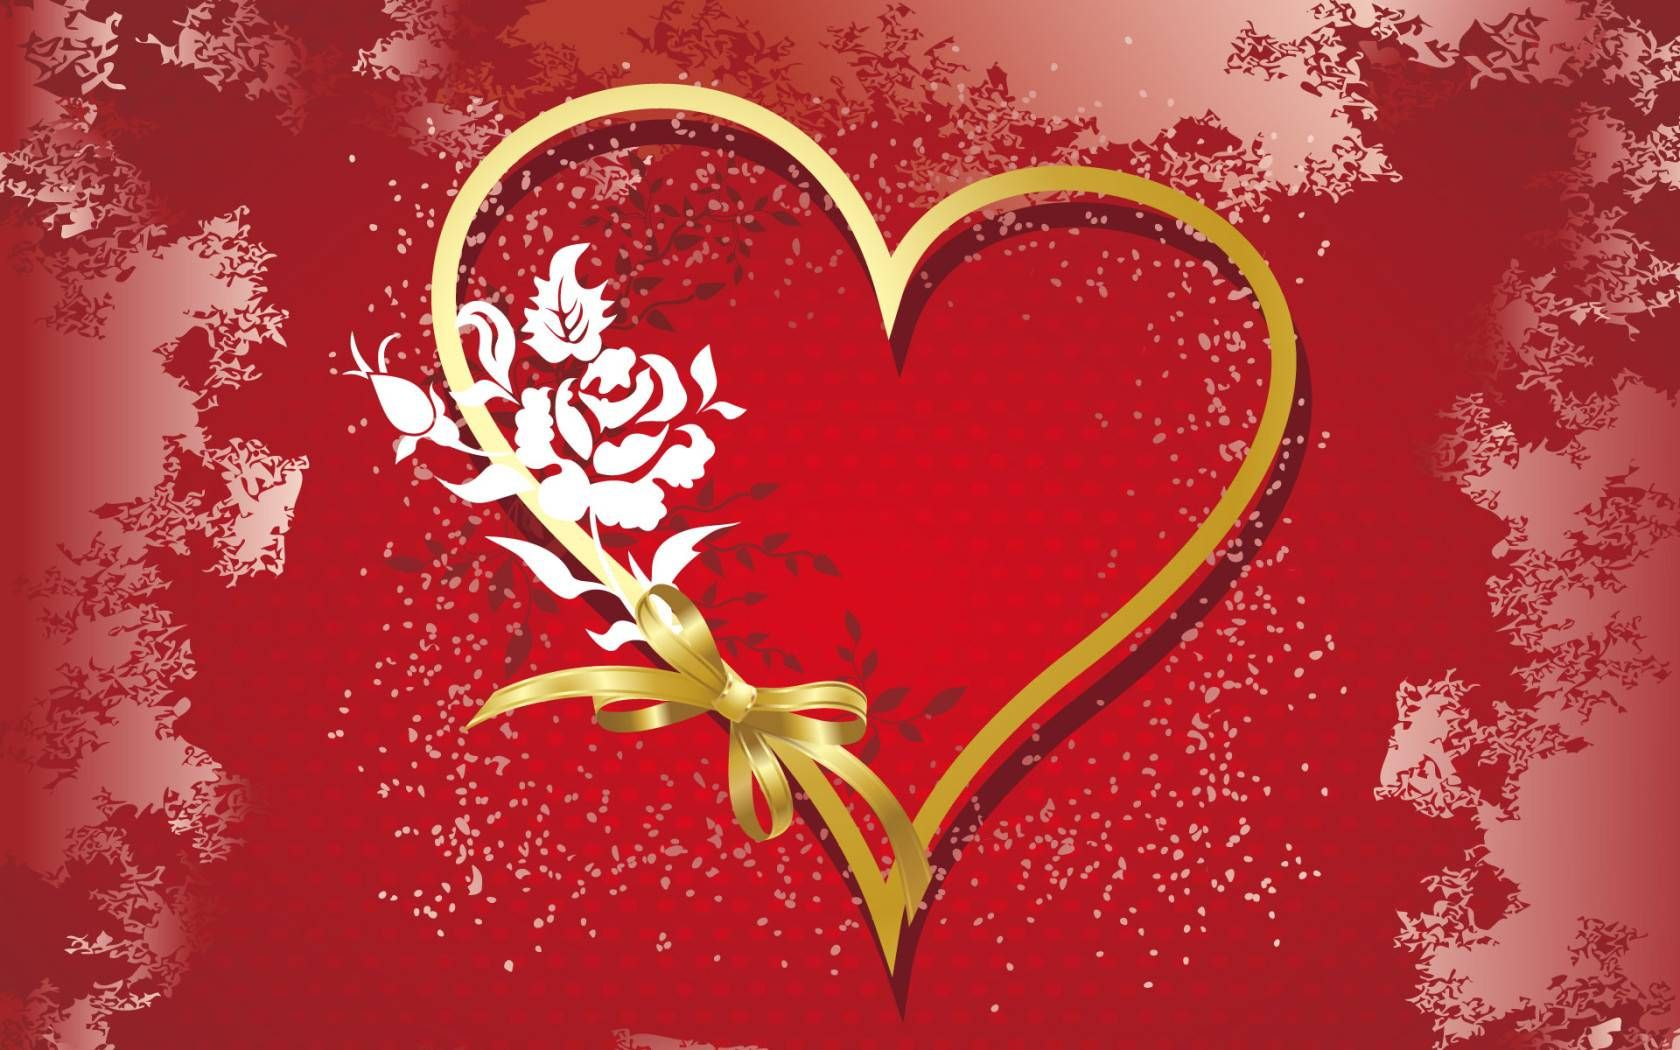 Hd Wedding Backgrounds Valentines Wallpaper Happy Valentines Day Images Valentines Day Greetings